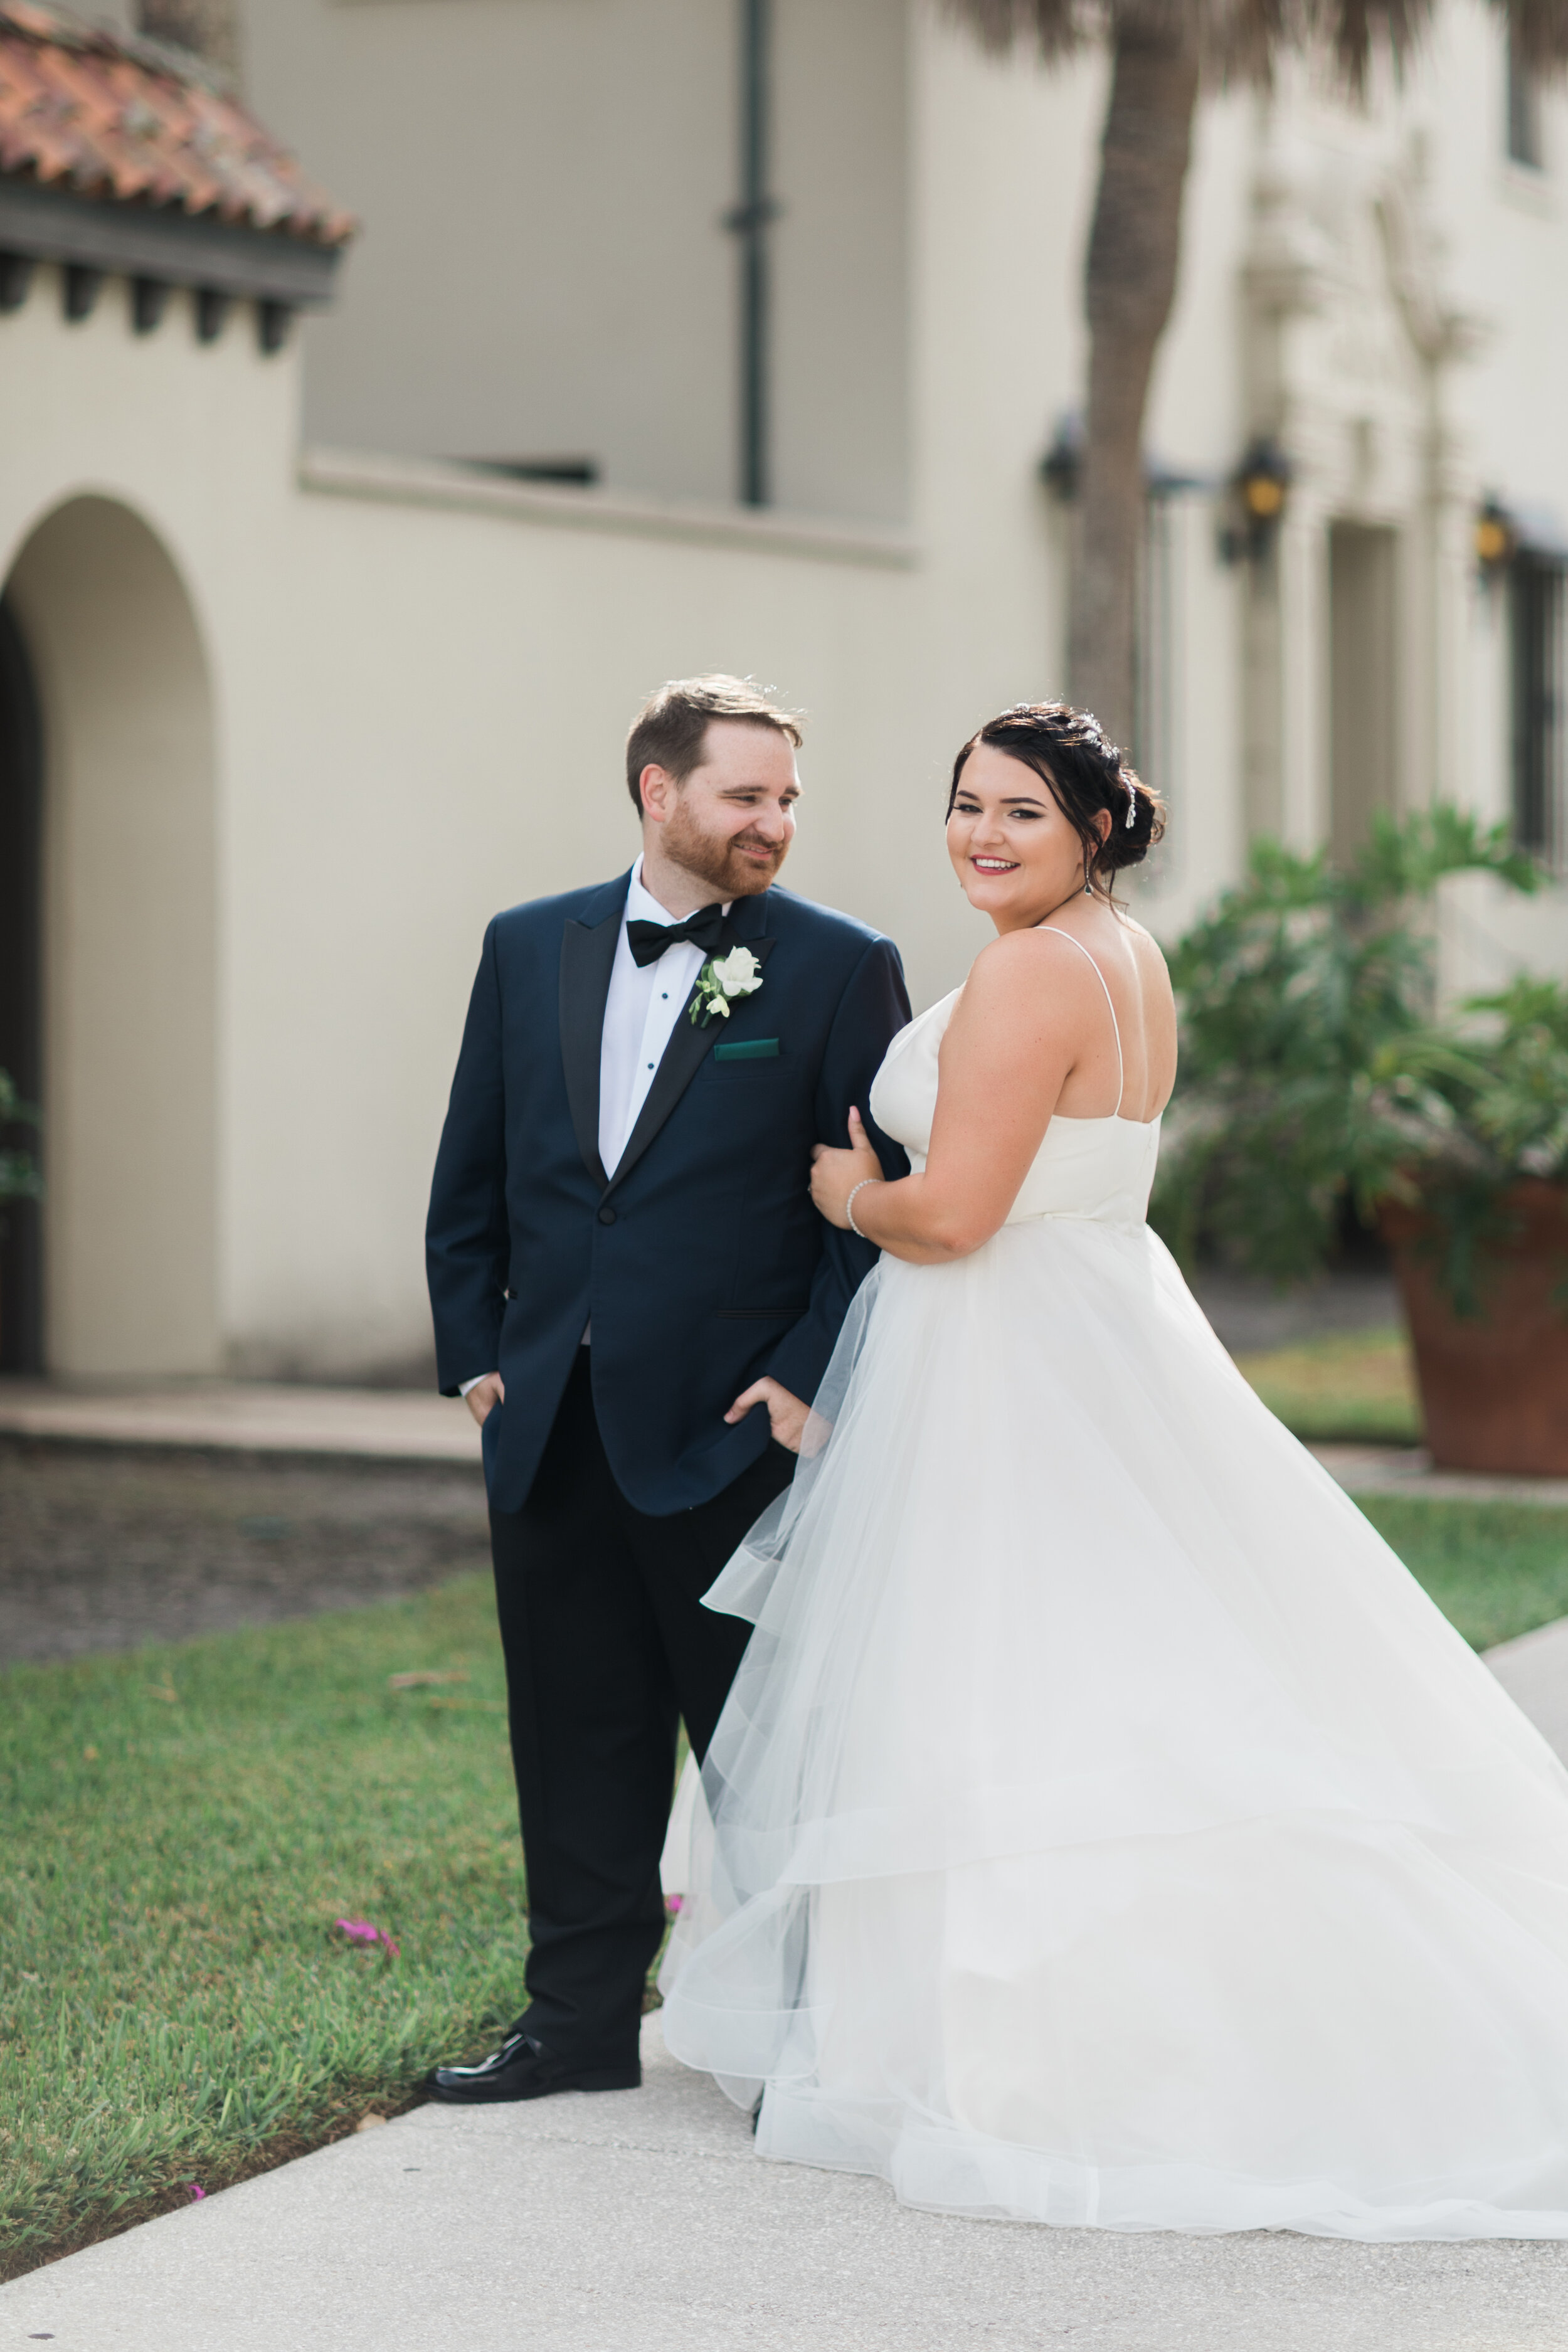 St_Augustine_Wedding_Photography_Treasury_on_the_Plaza_Wedding__0041_.jpg